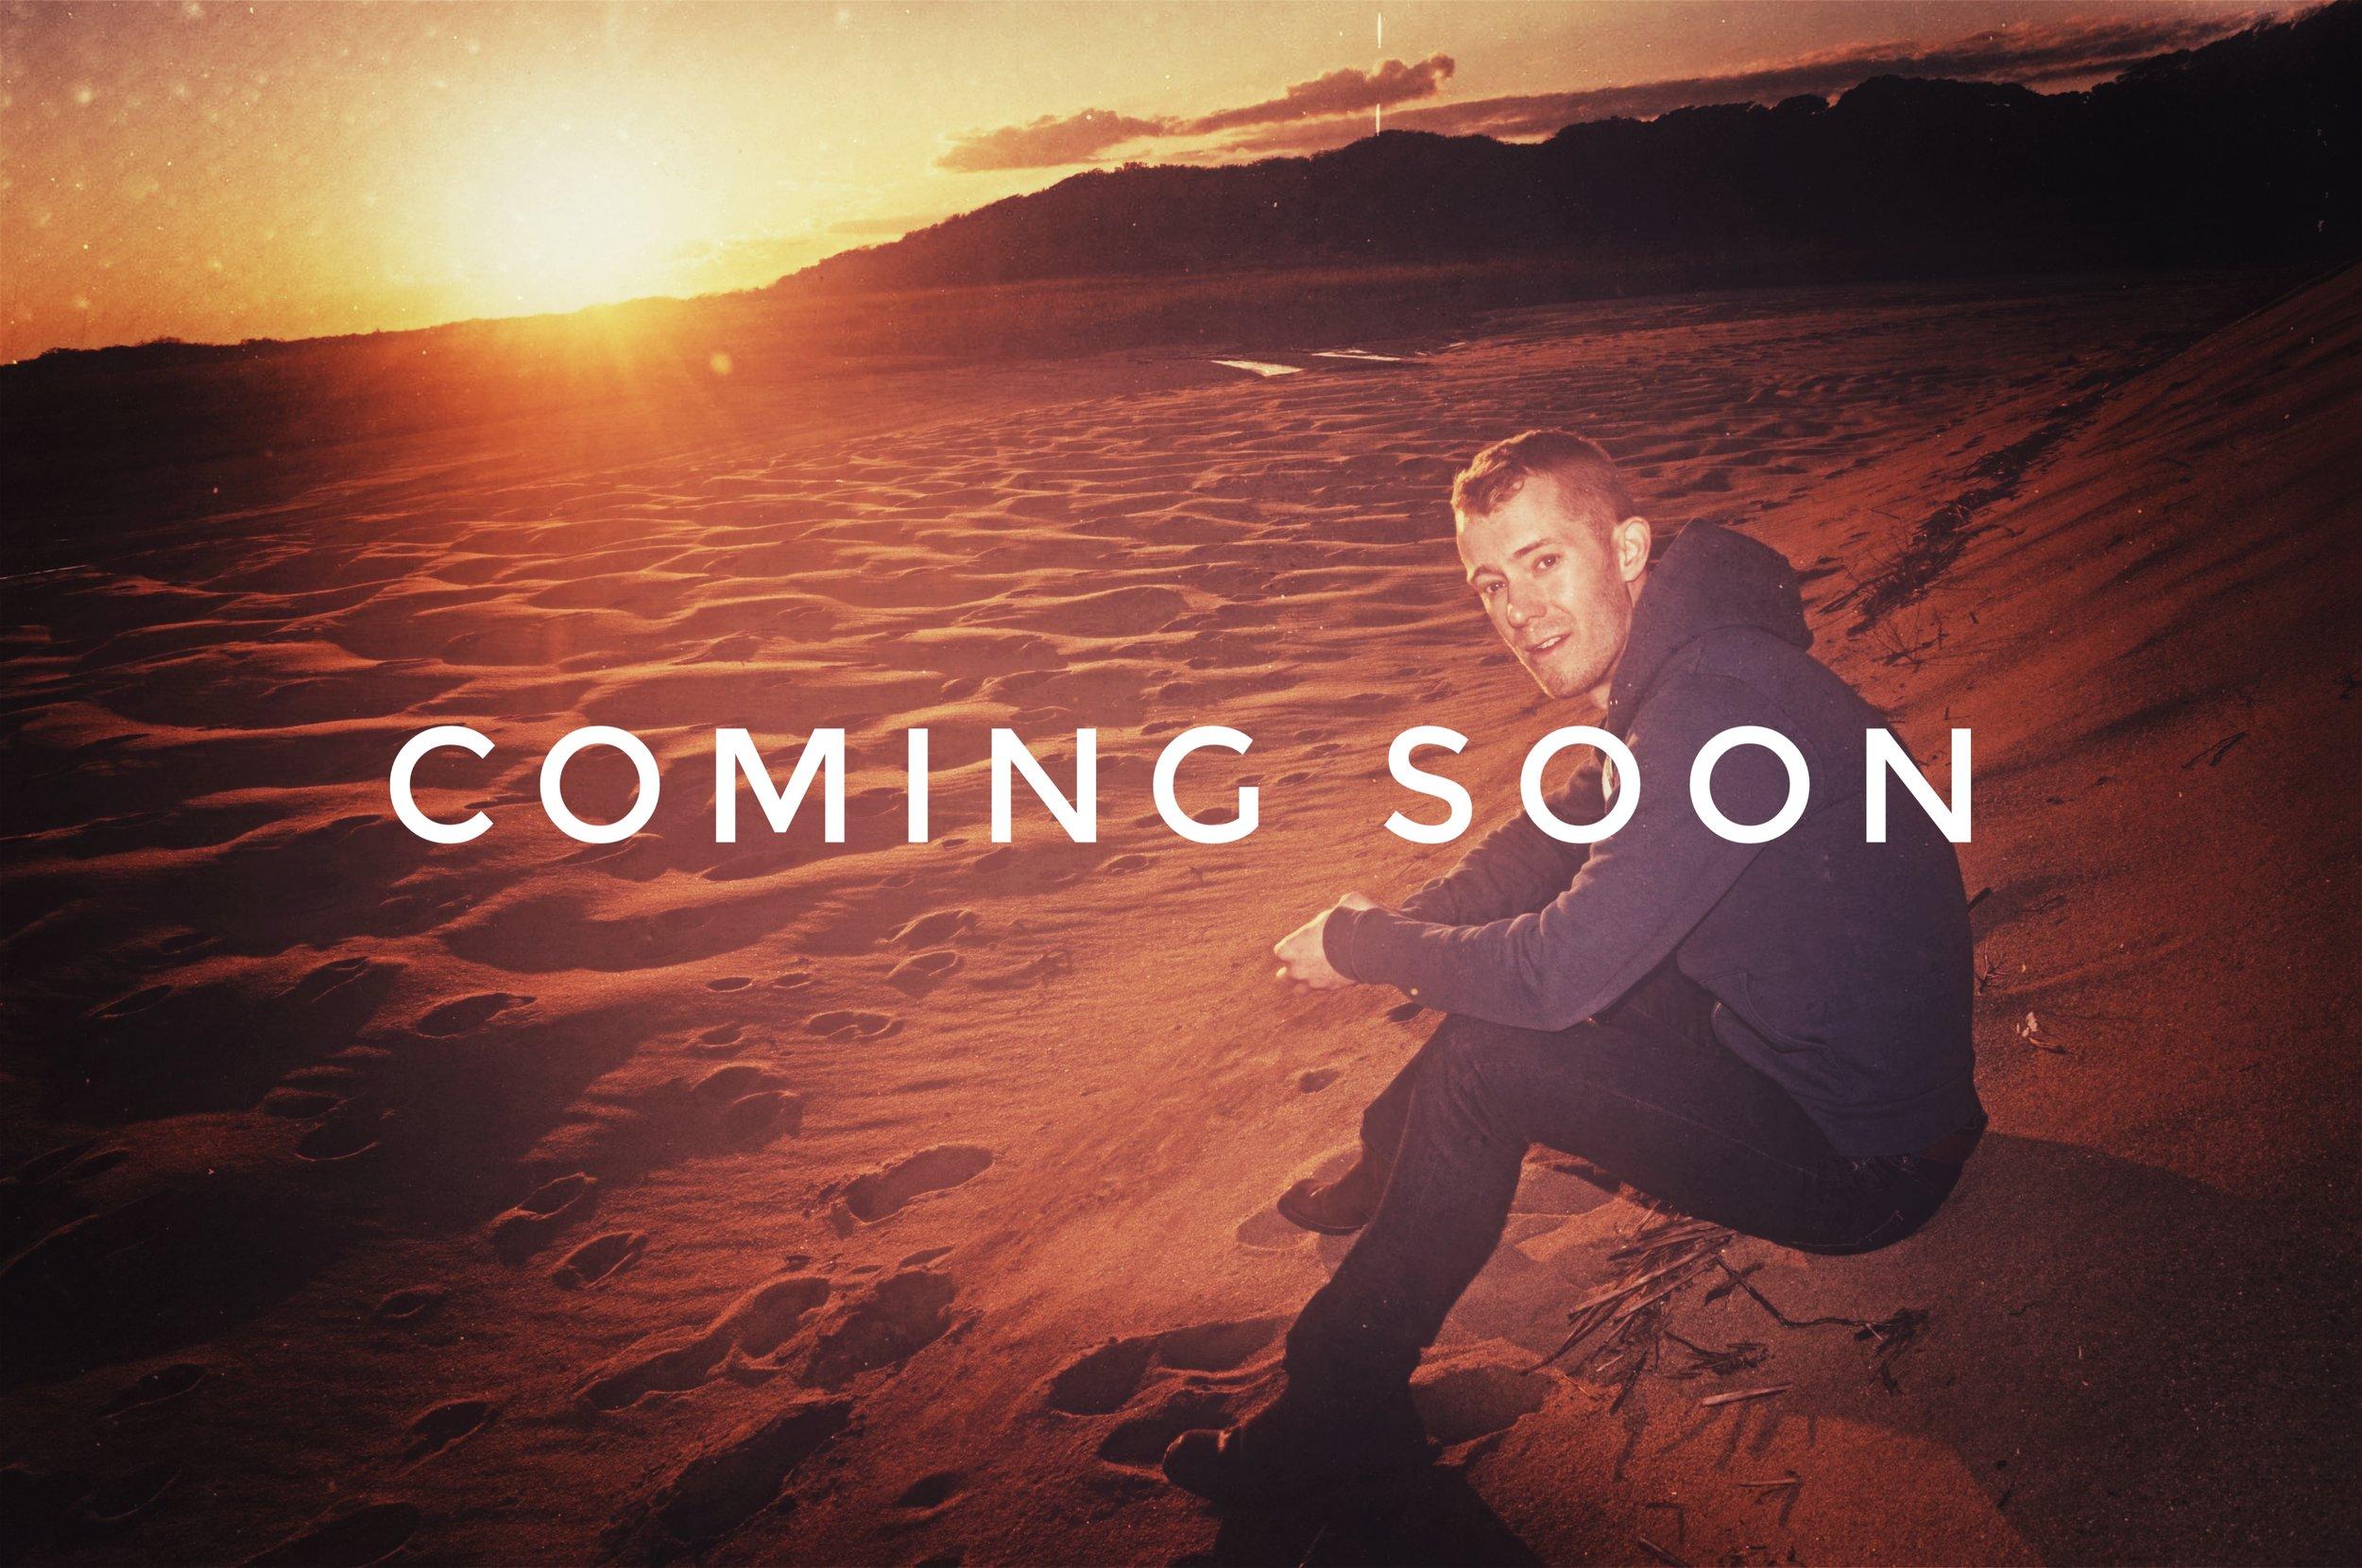 Jon Richardson's Second Studio Album will be available in February, 2019.